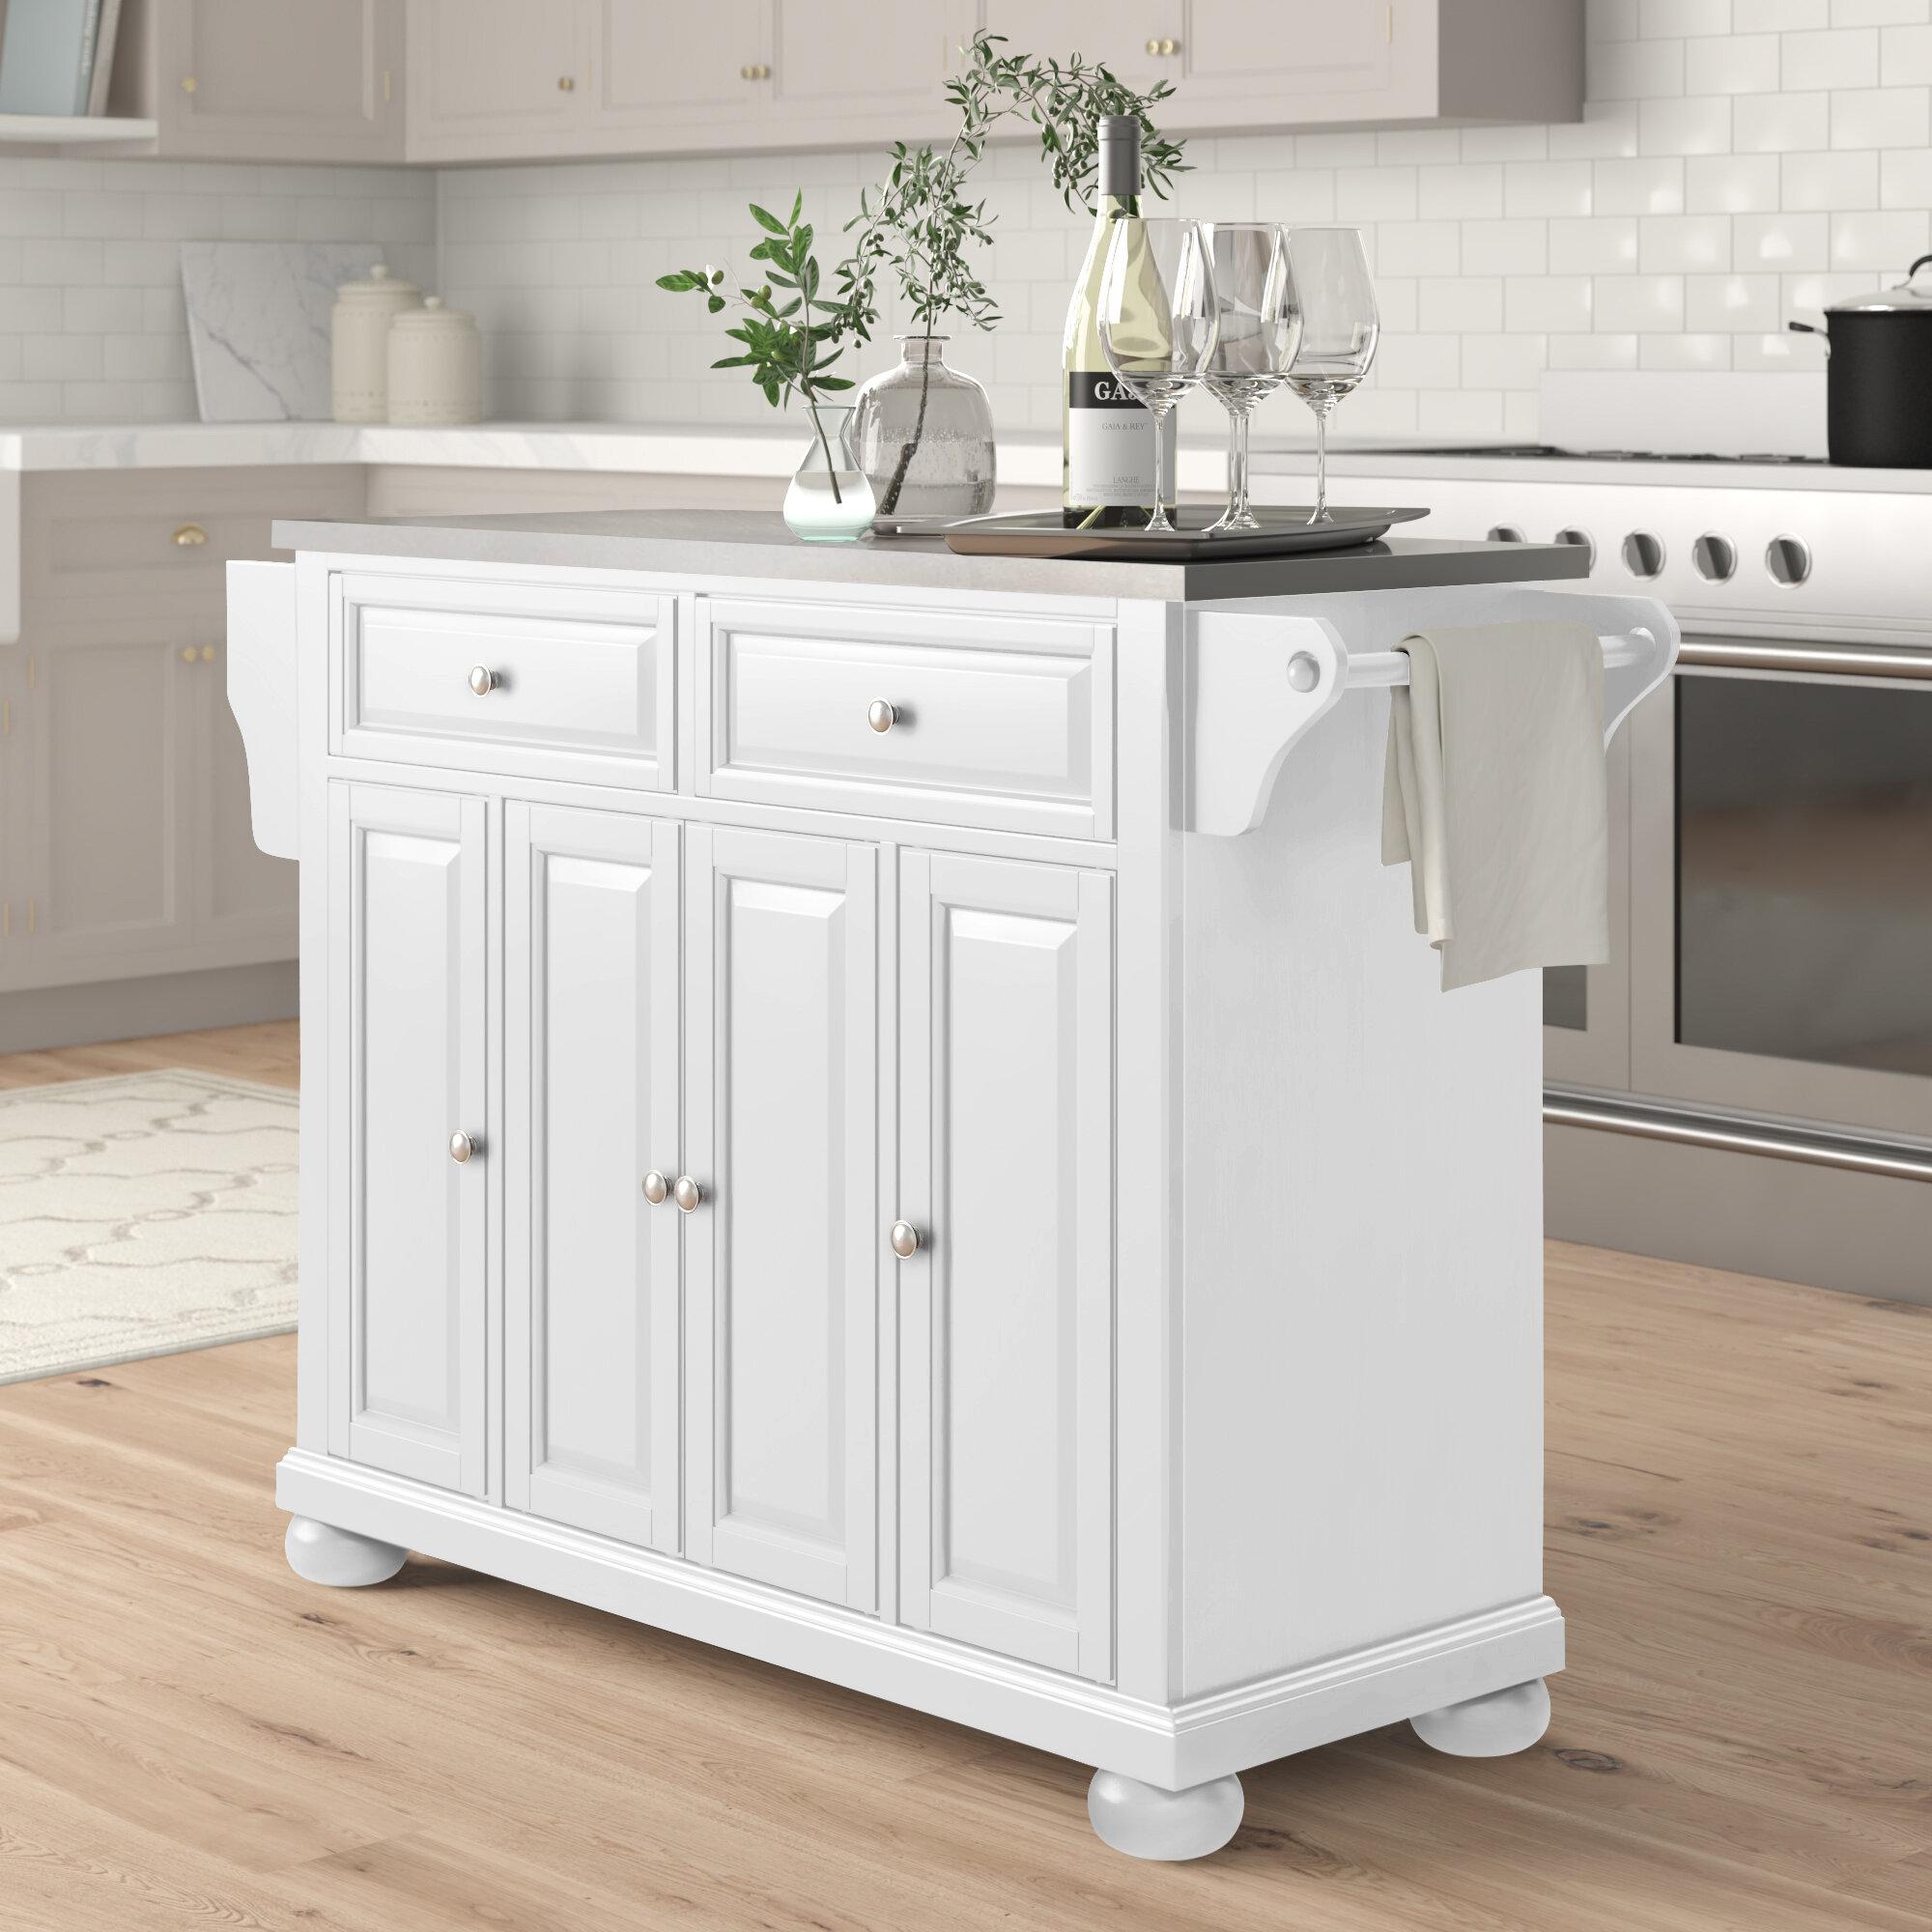 White Kitchen Islands Carts You Ll Love In 2020 Wayfair